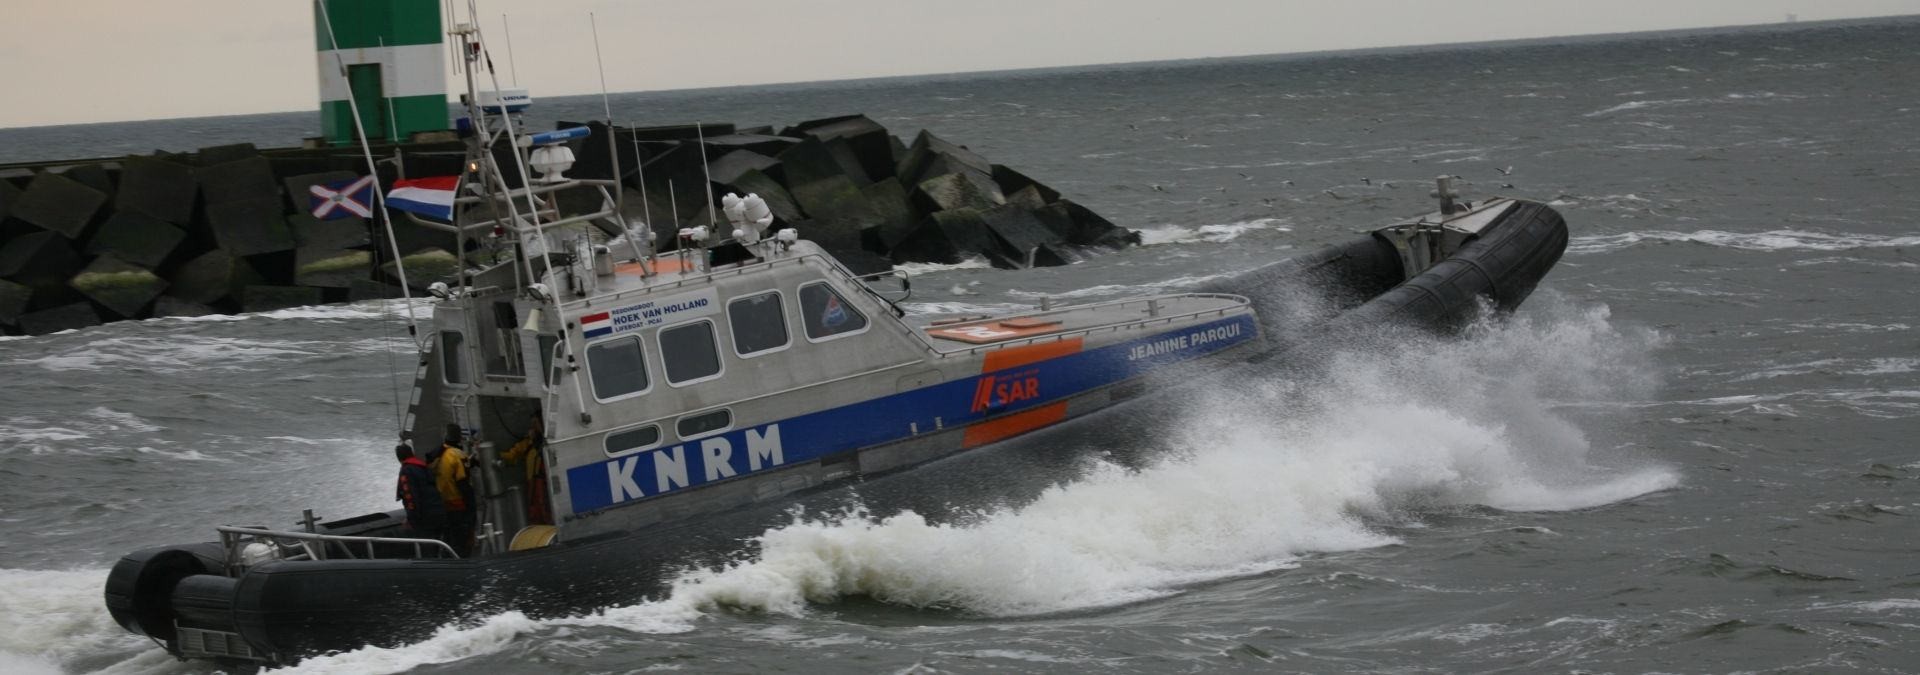 Reddingboot Jeanine Parqui